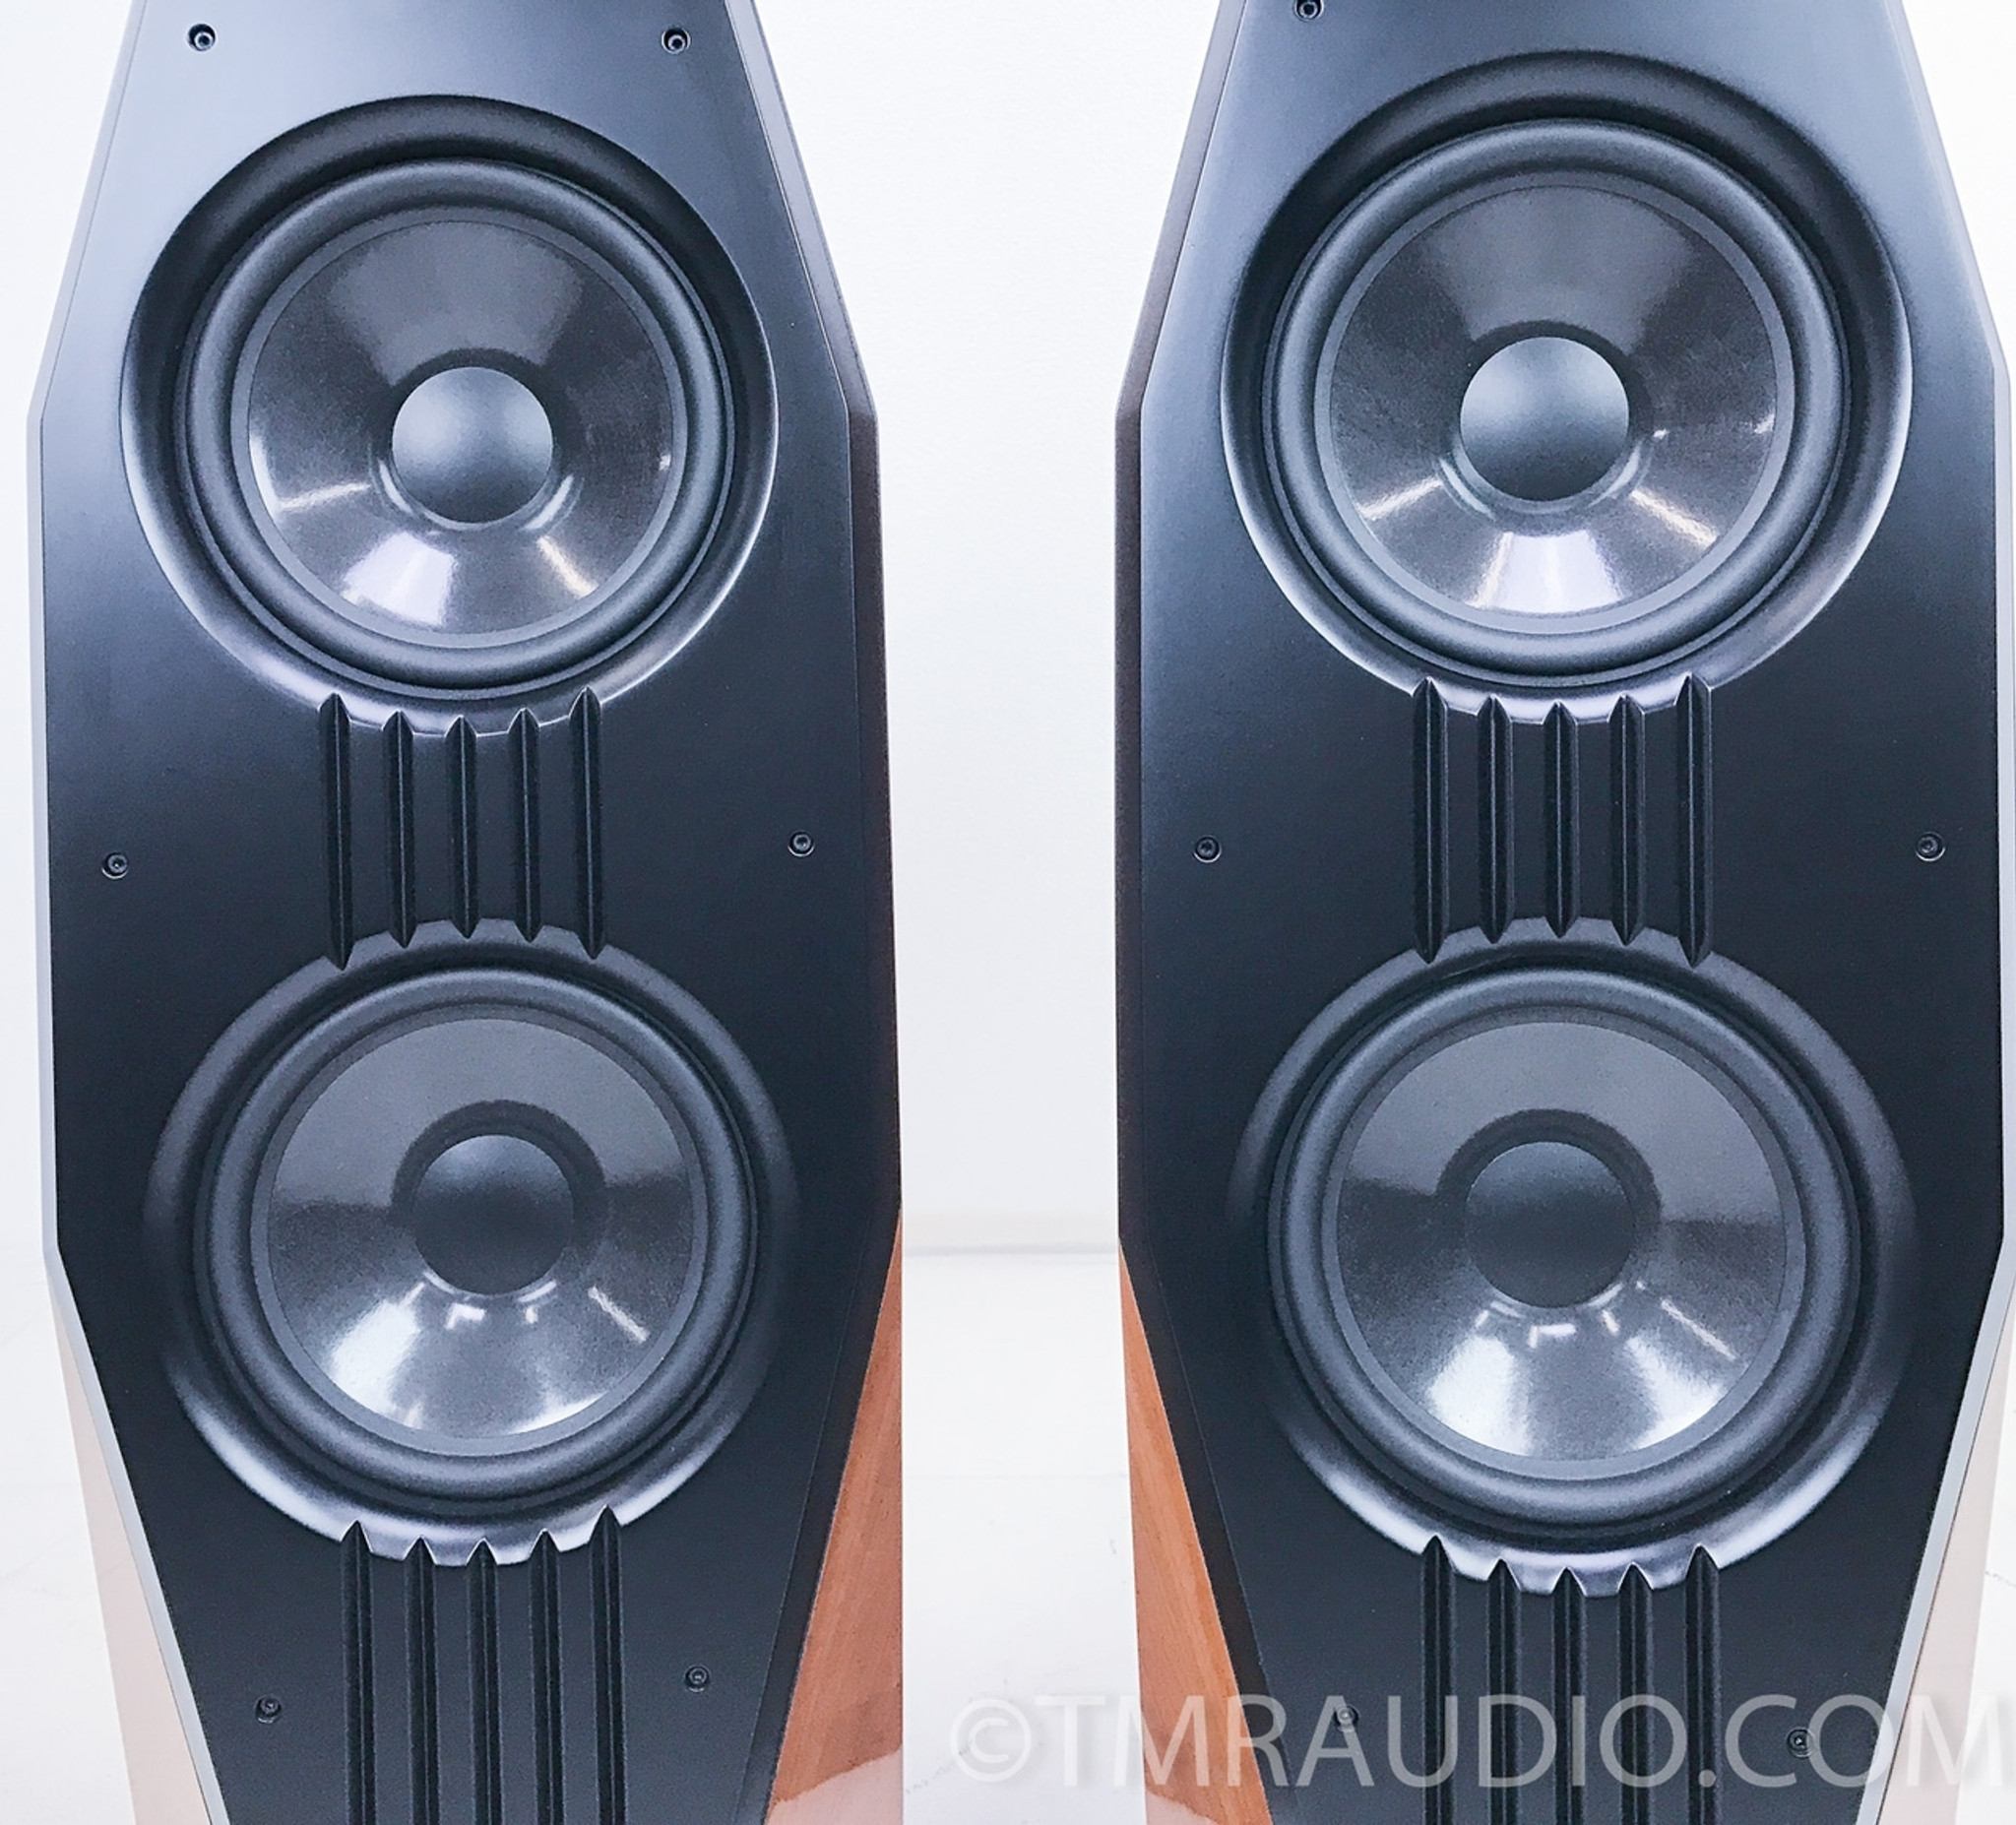 Lawrence Audio Cello Floorstanding Speakers Pair The Music Room